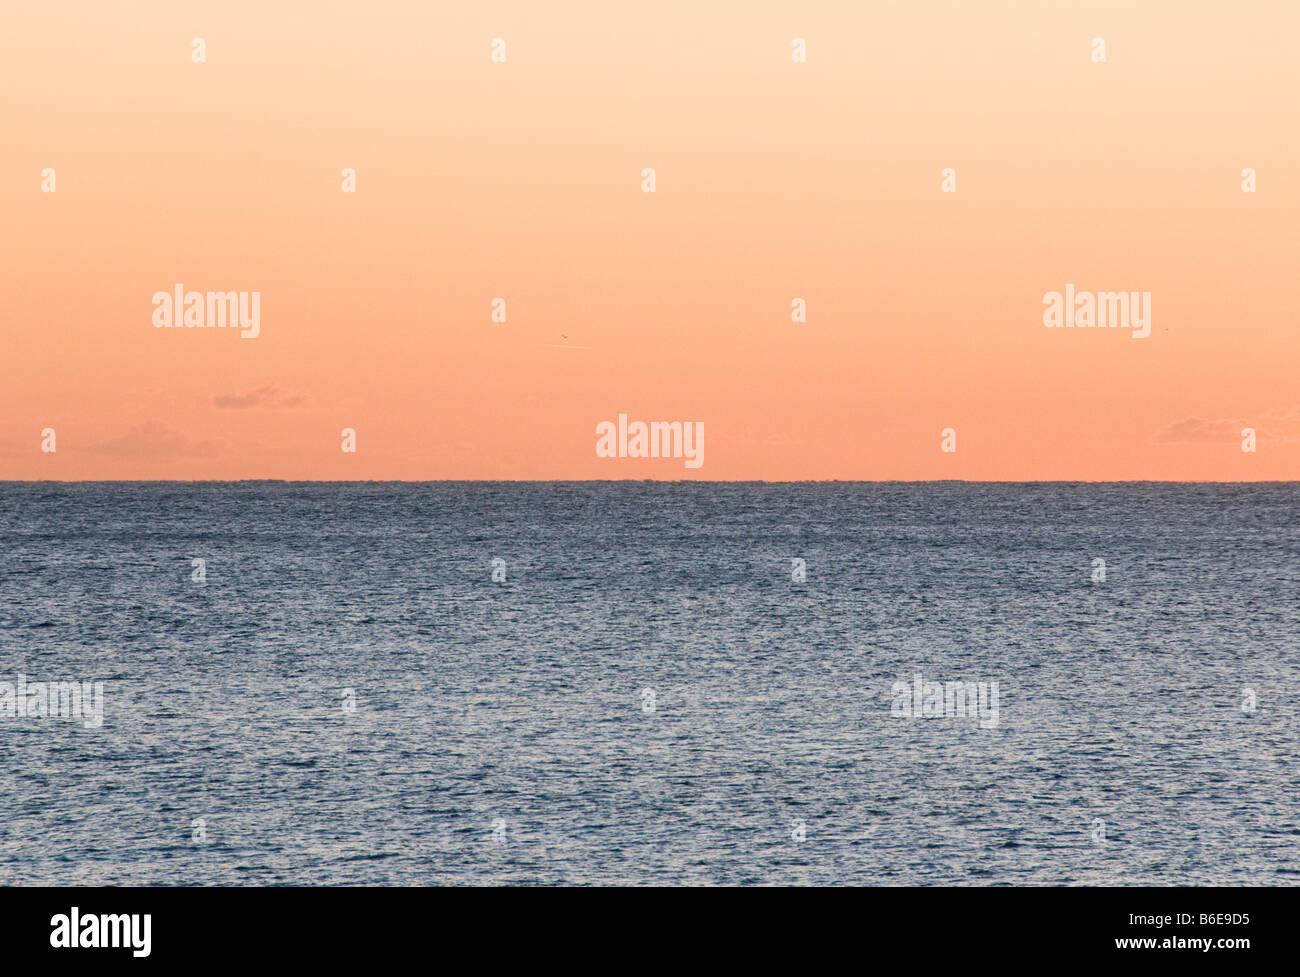 Der Horizont auf dem Meer Stockbild